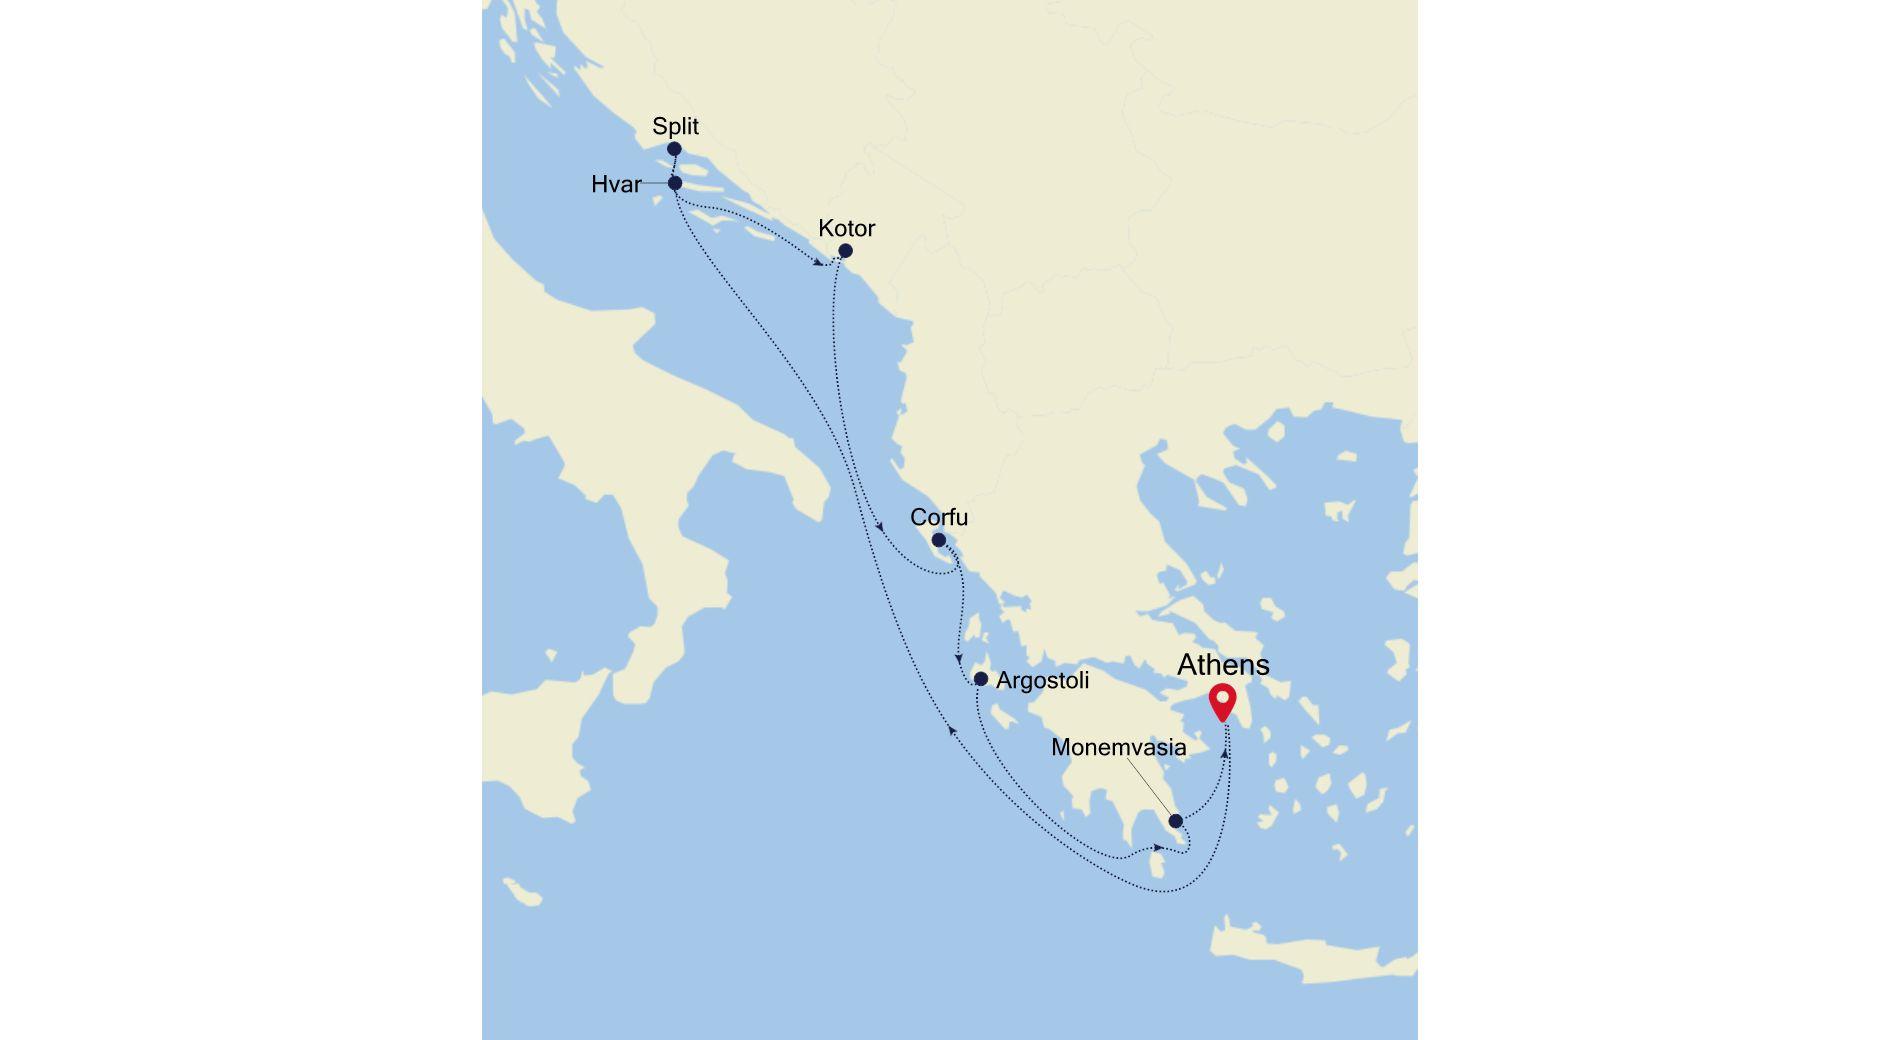 SS200514009 - Venice to Athens